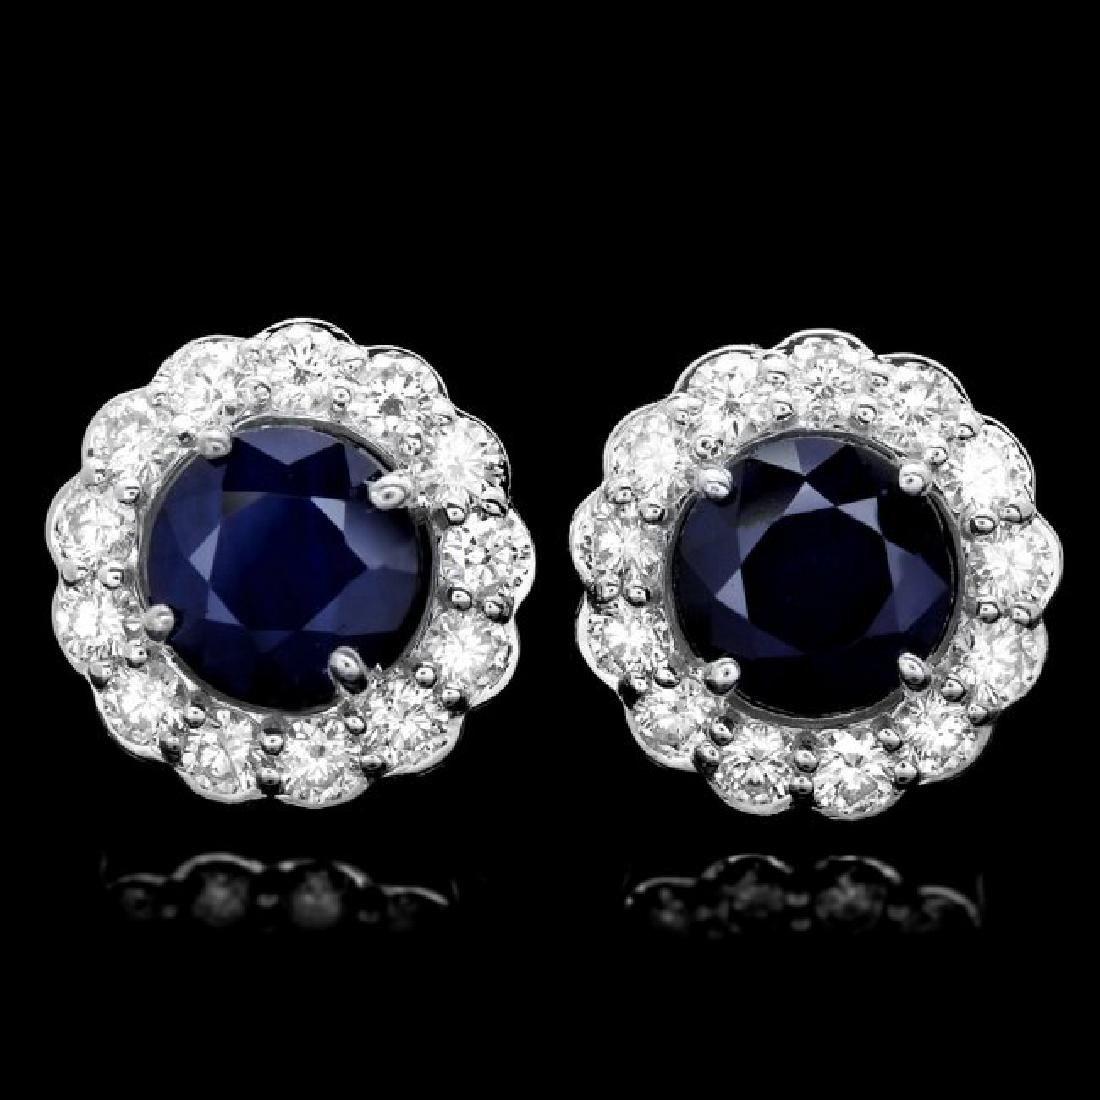 14k Gold 3ct Sapphire 1.15ct Diamond Earrings - 3